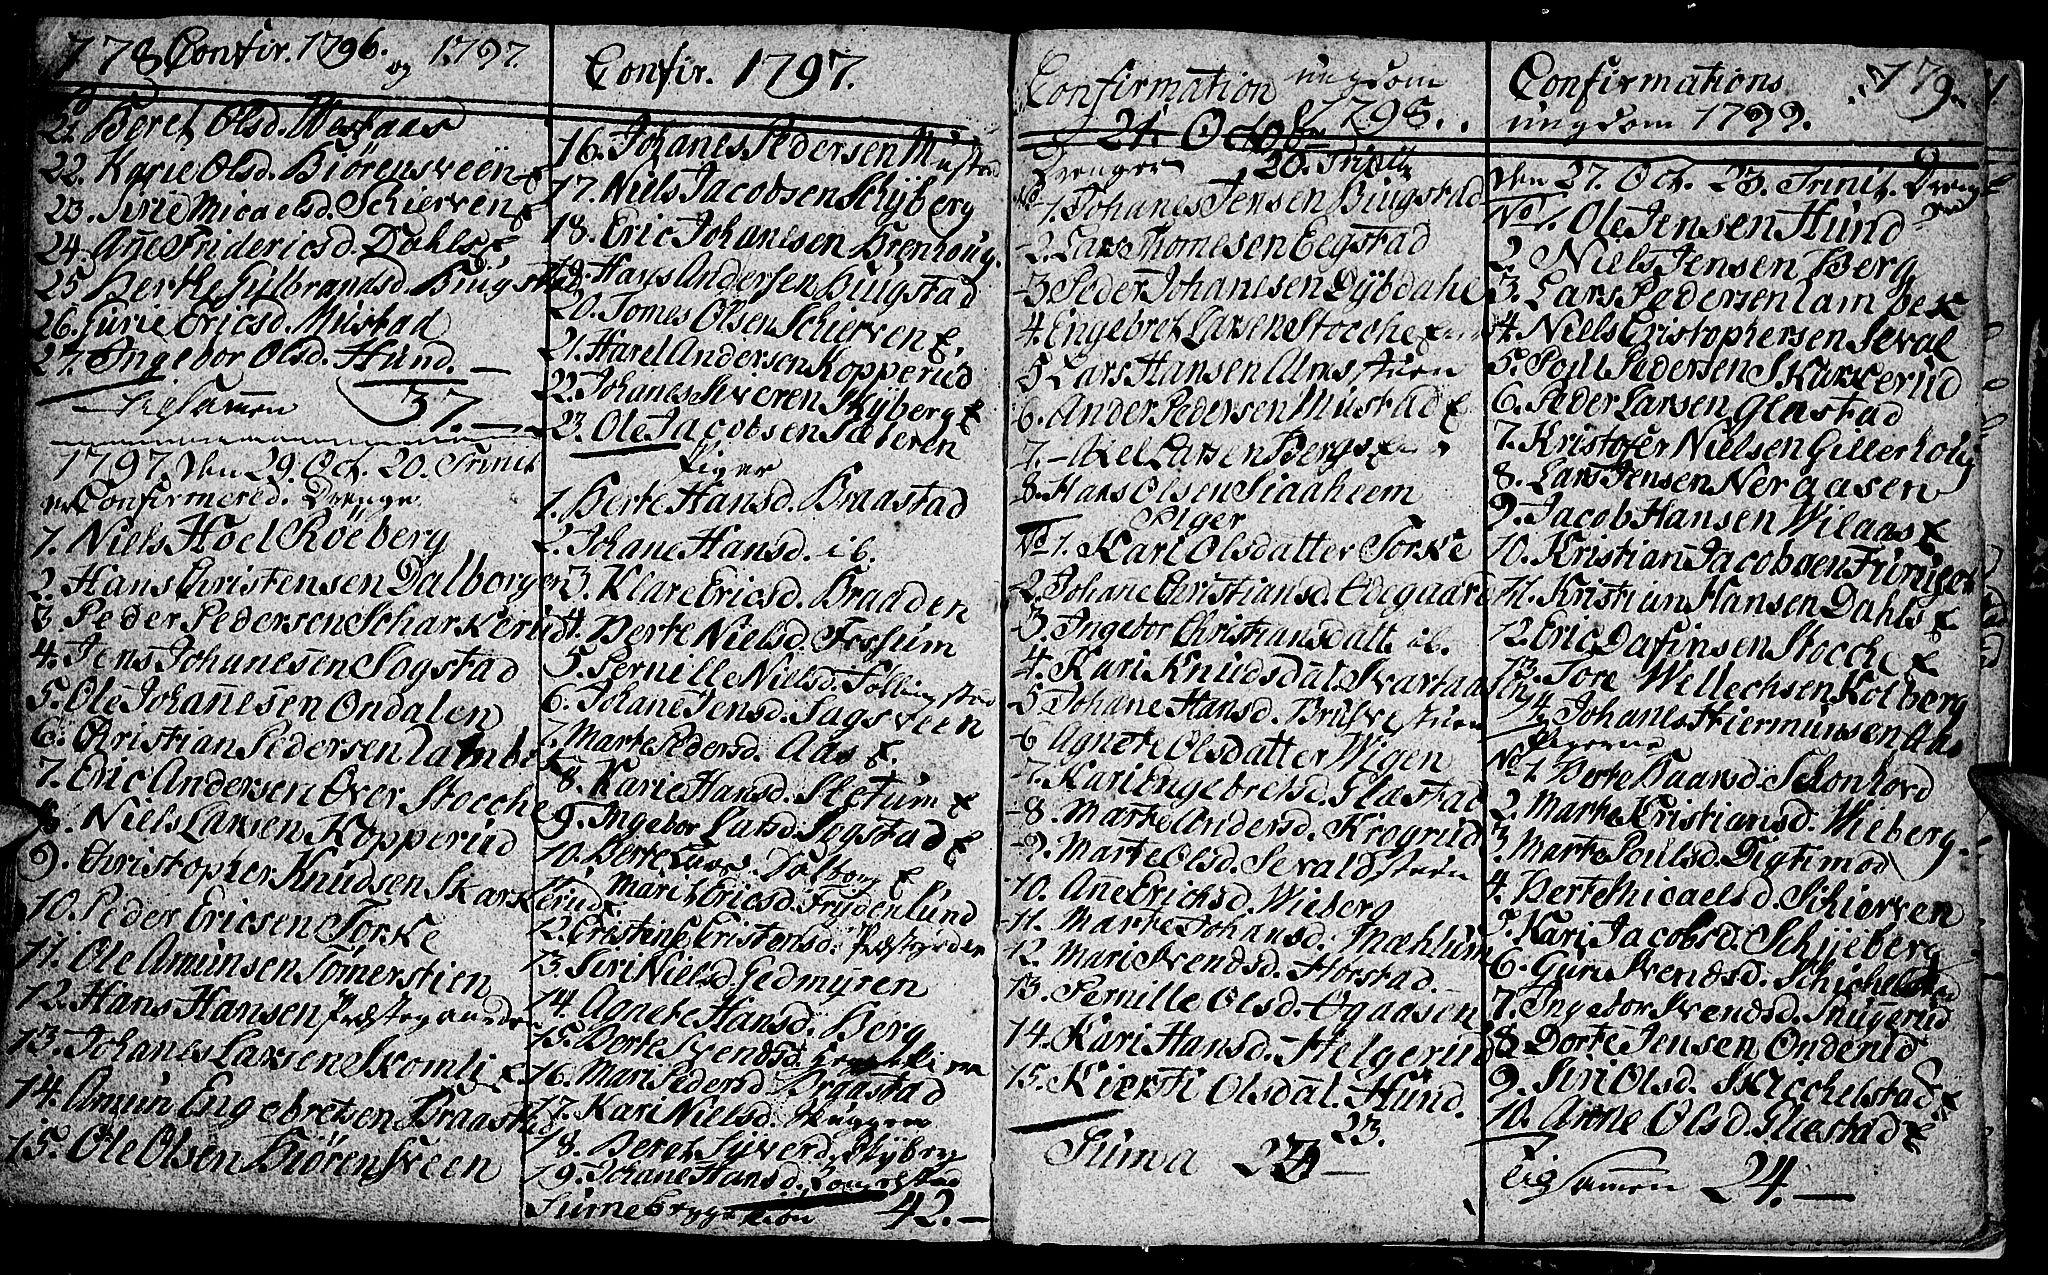 SAH, Vardal prestekontor, H/Ha/Hab/L0002: Klokkerbok nr. 2, 1790-1803, s. 178-179